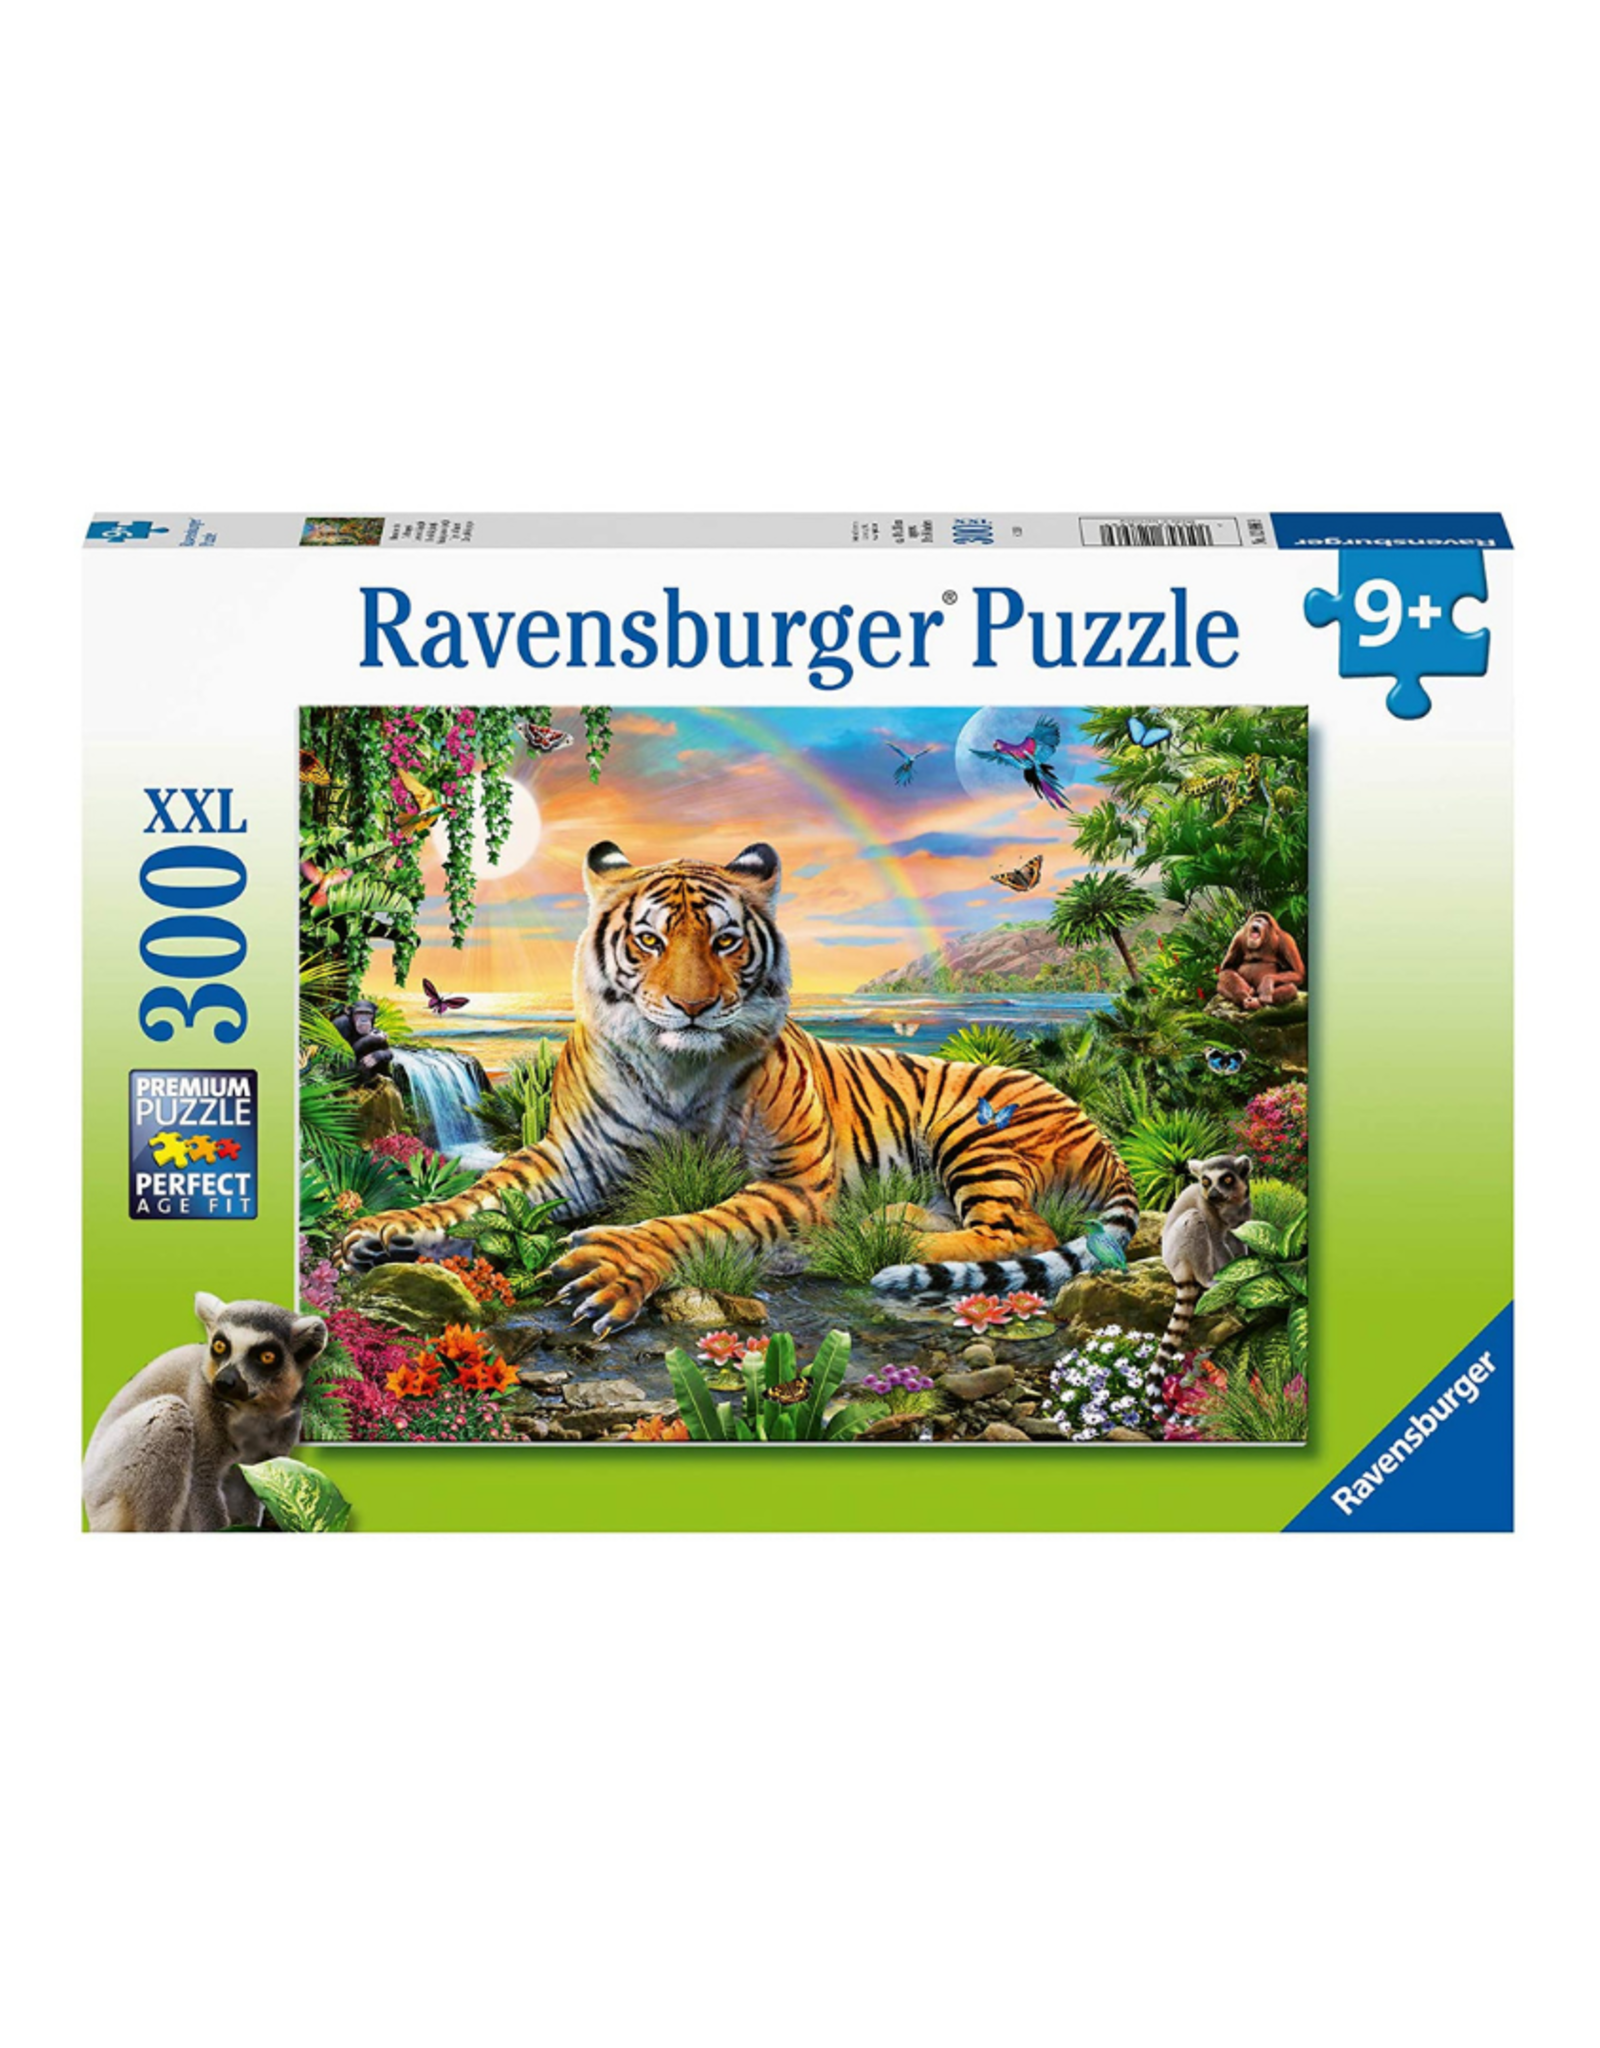 Ravensburger Jungle Tiger 300pc Puzzle